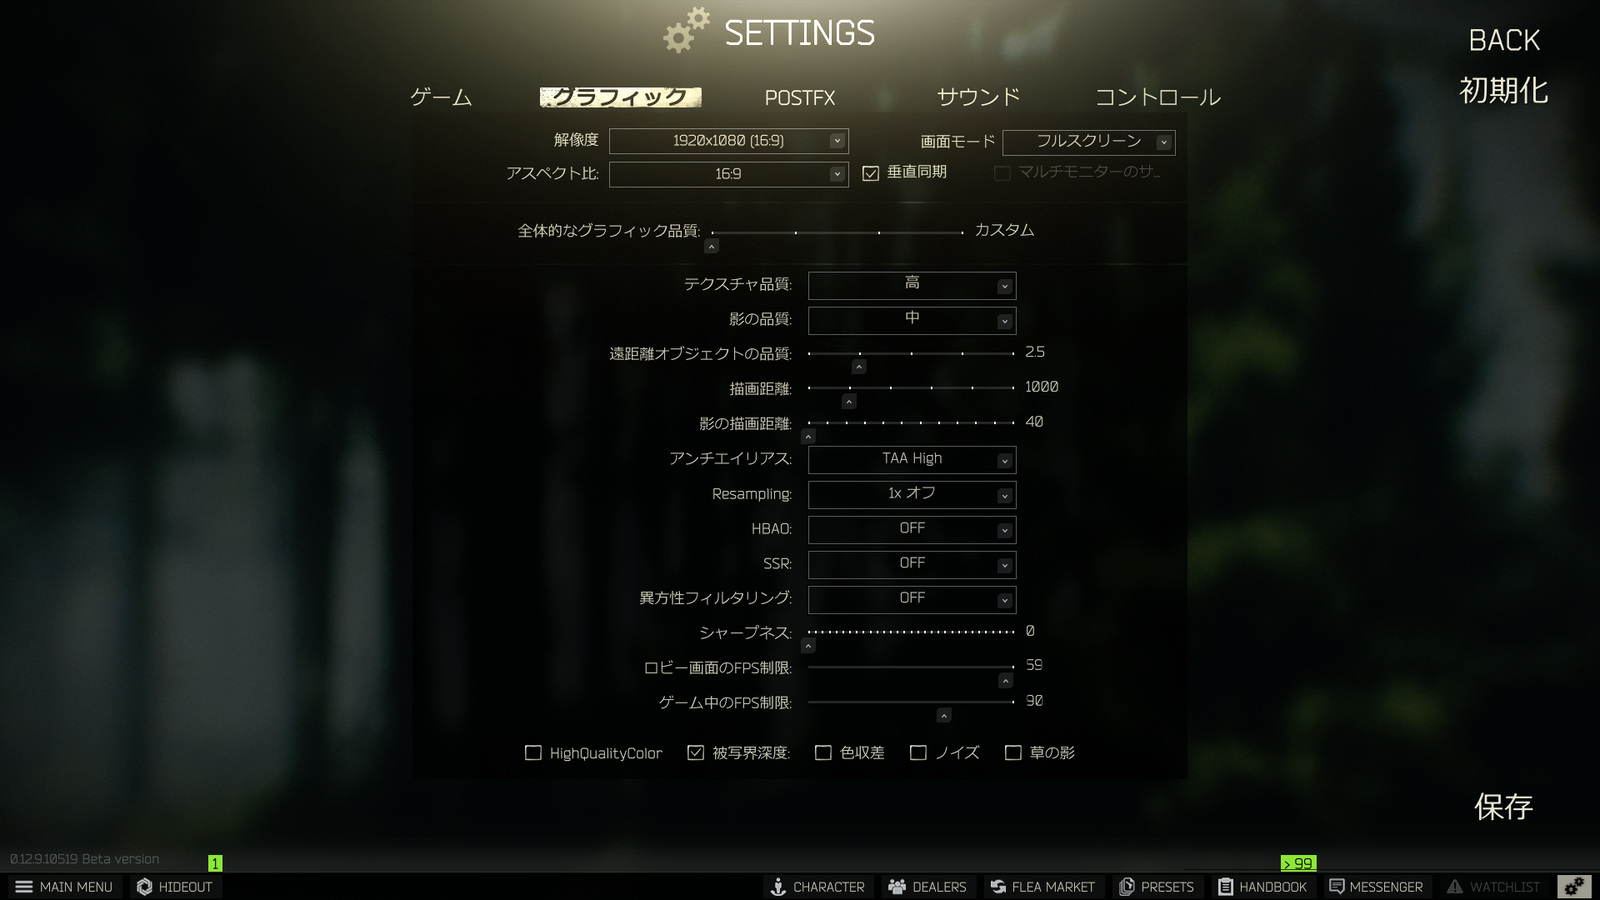 f:id:gamelifecompany55:20210107012136p:plain